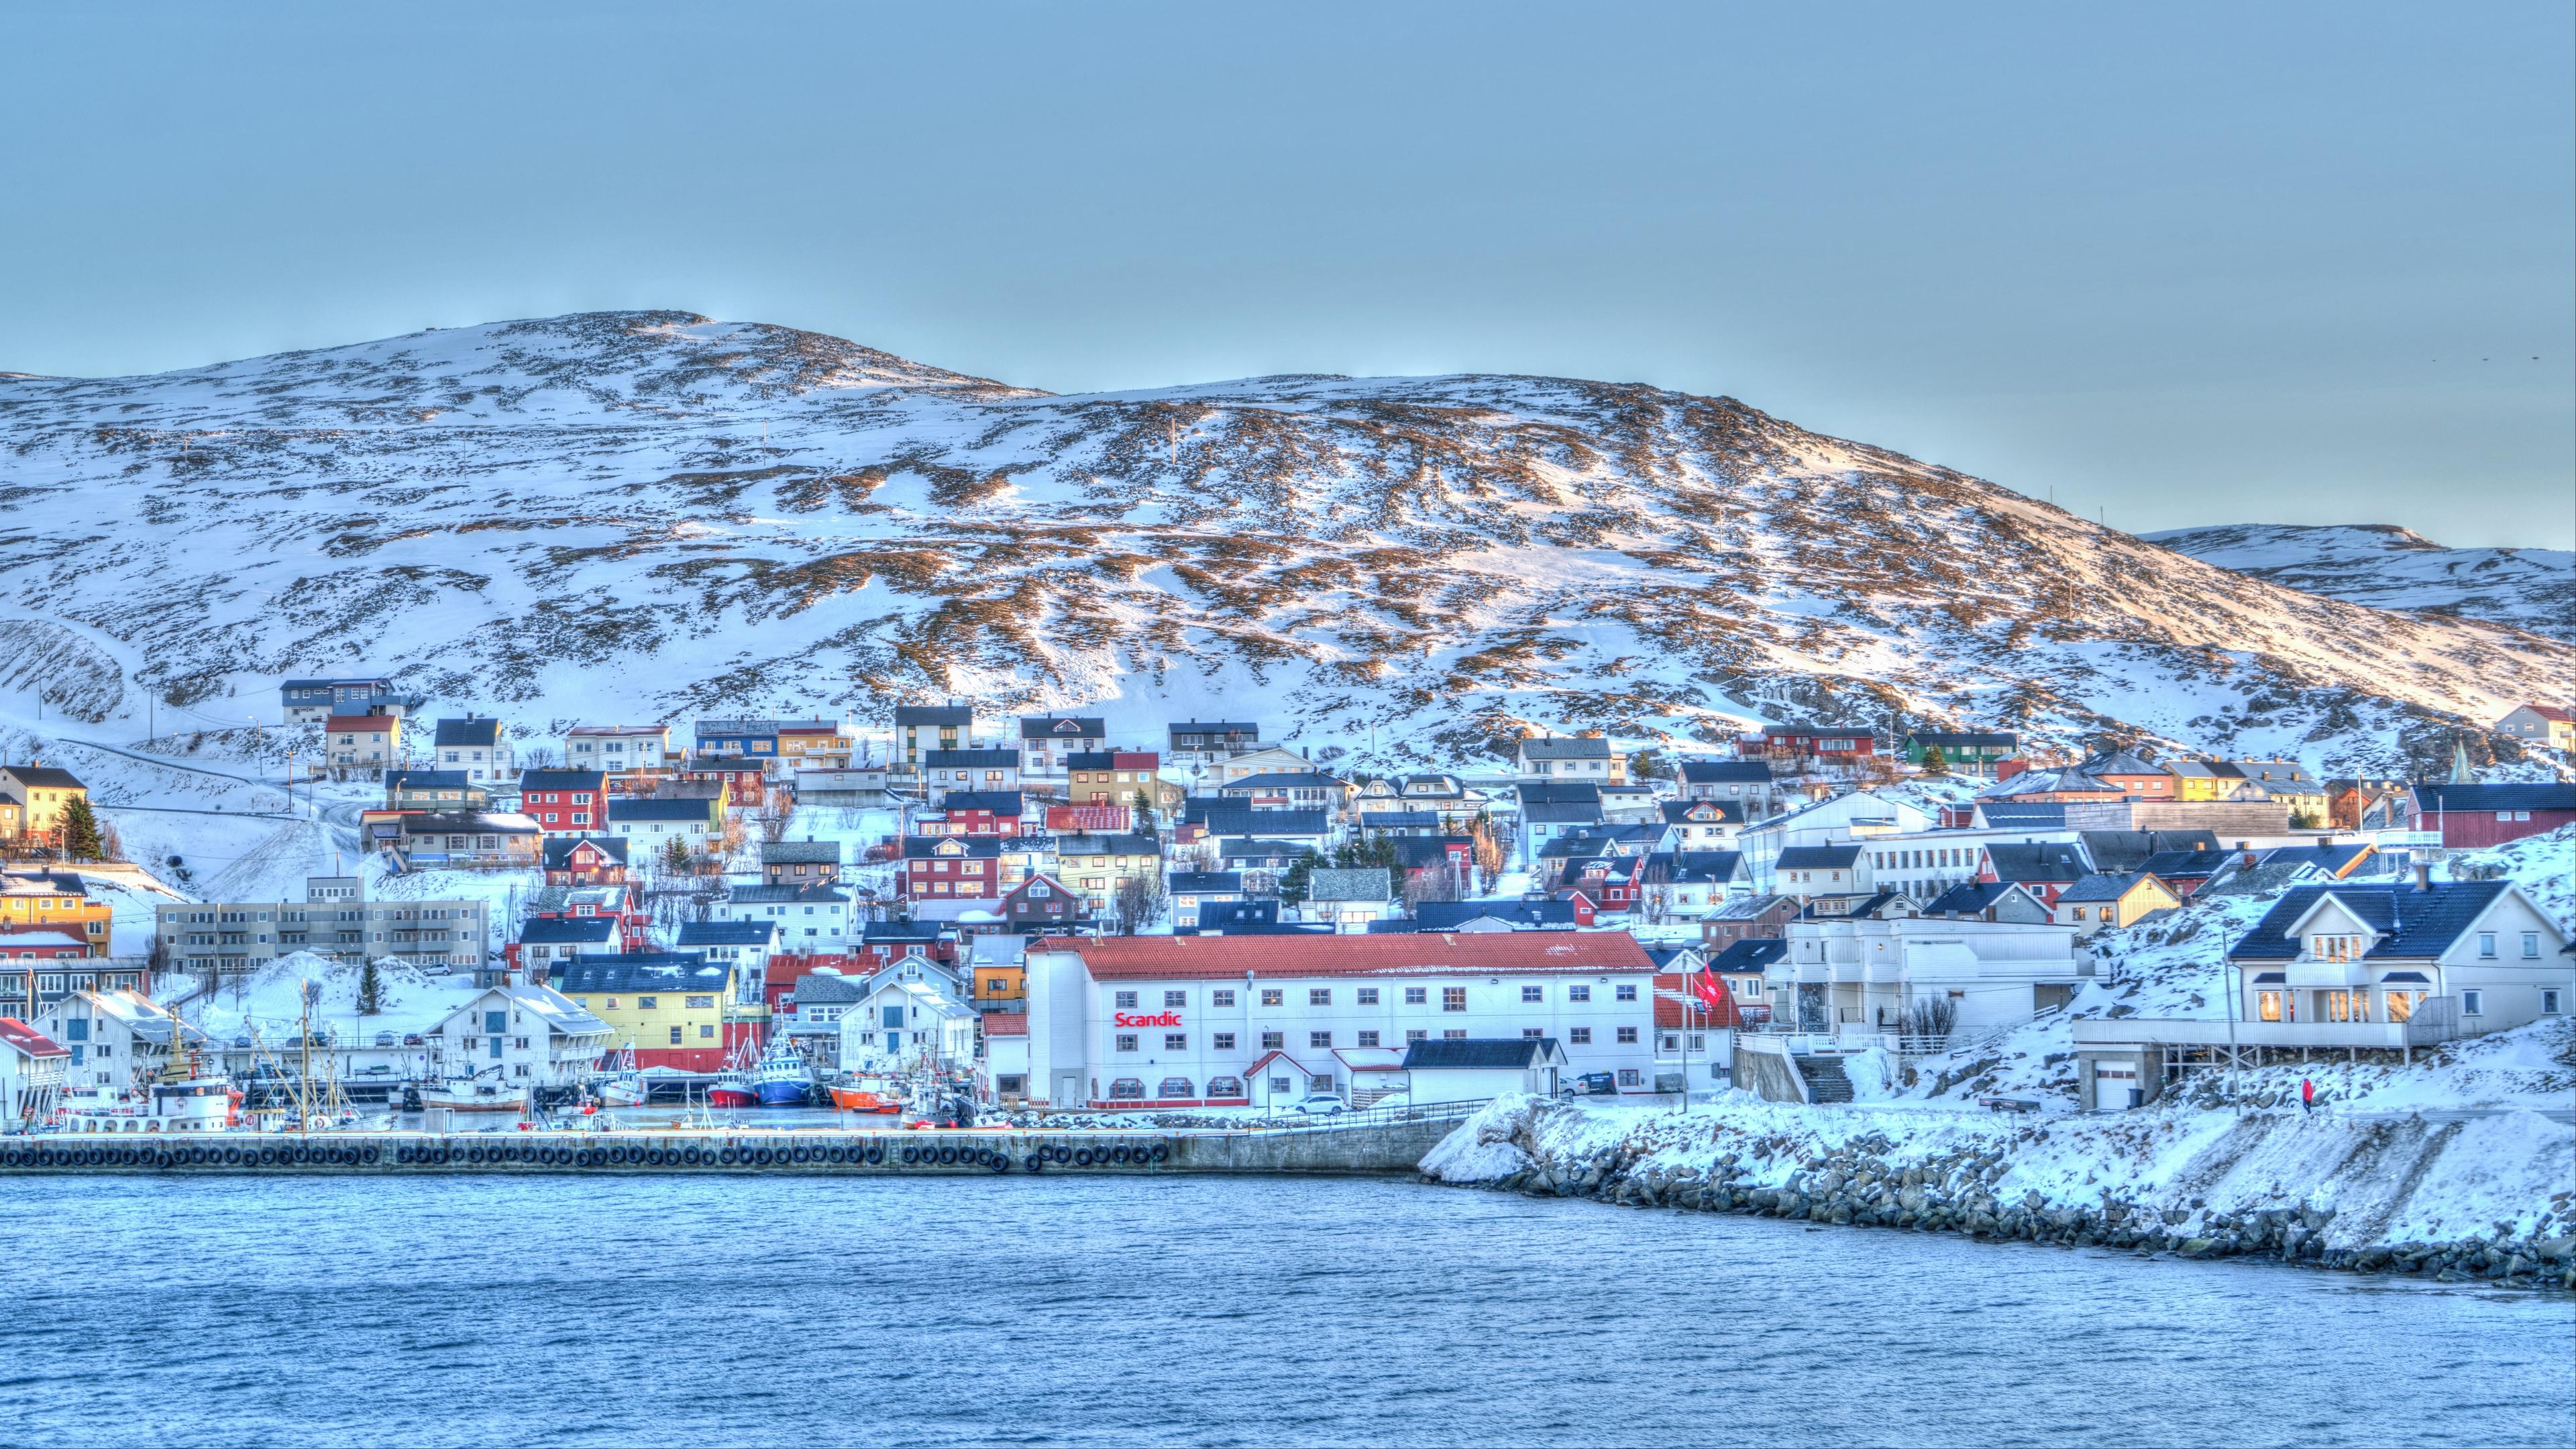 norway coast sea scandinavia harbor 4k 1538065473 - norway, coast, sea, scandinavia, harbor 4k - Sea, Norway, Coast